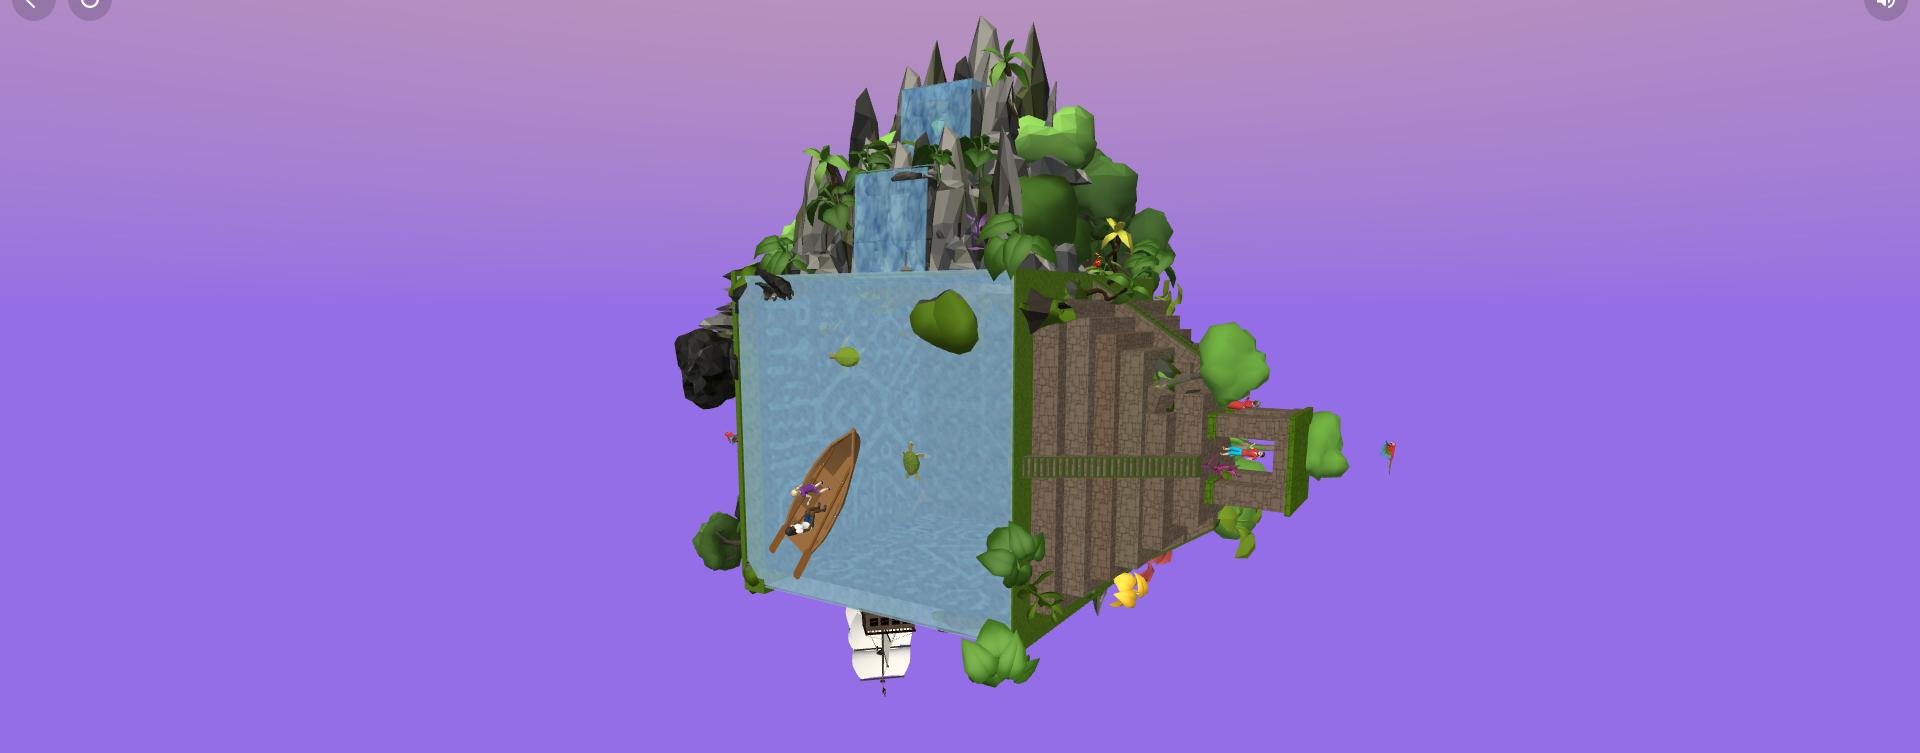 pantalla del software cospaces